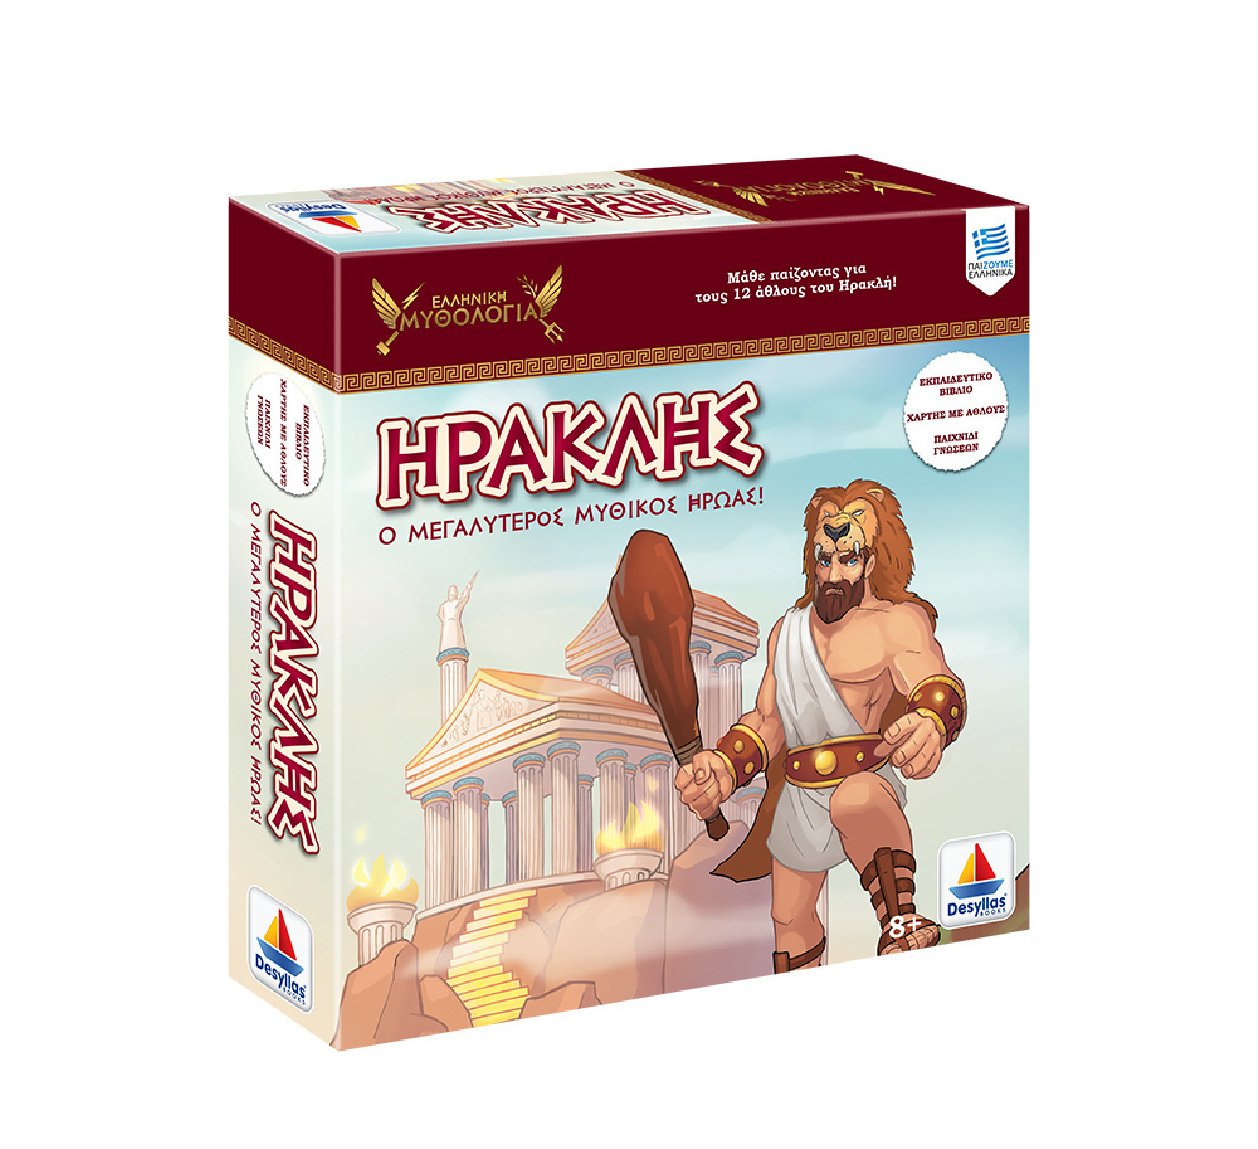 Desyllas Games Ηρακλής: Ο Μεγαλύτερος Μυθικός Ήρωας 150005